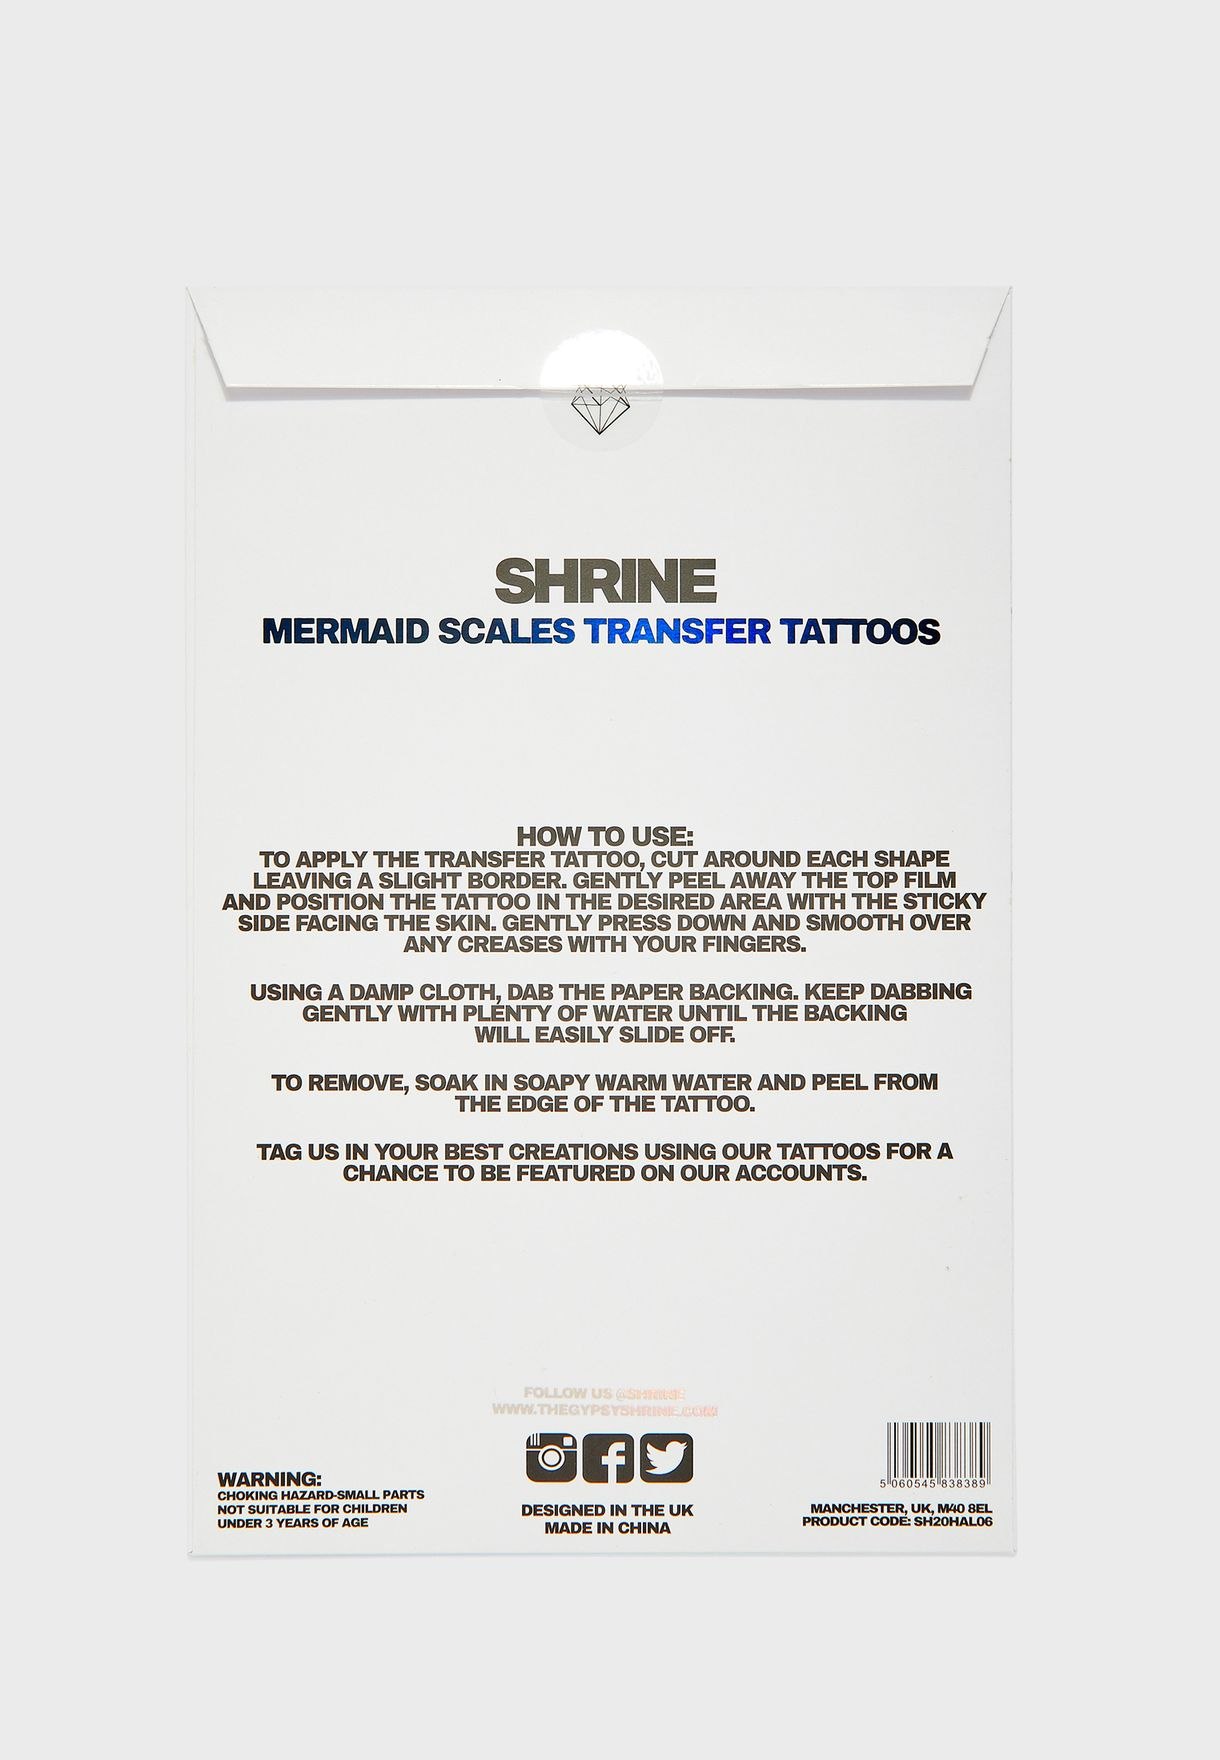 Mermaid Scales Transfer Tattoos